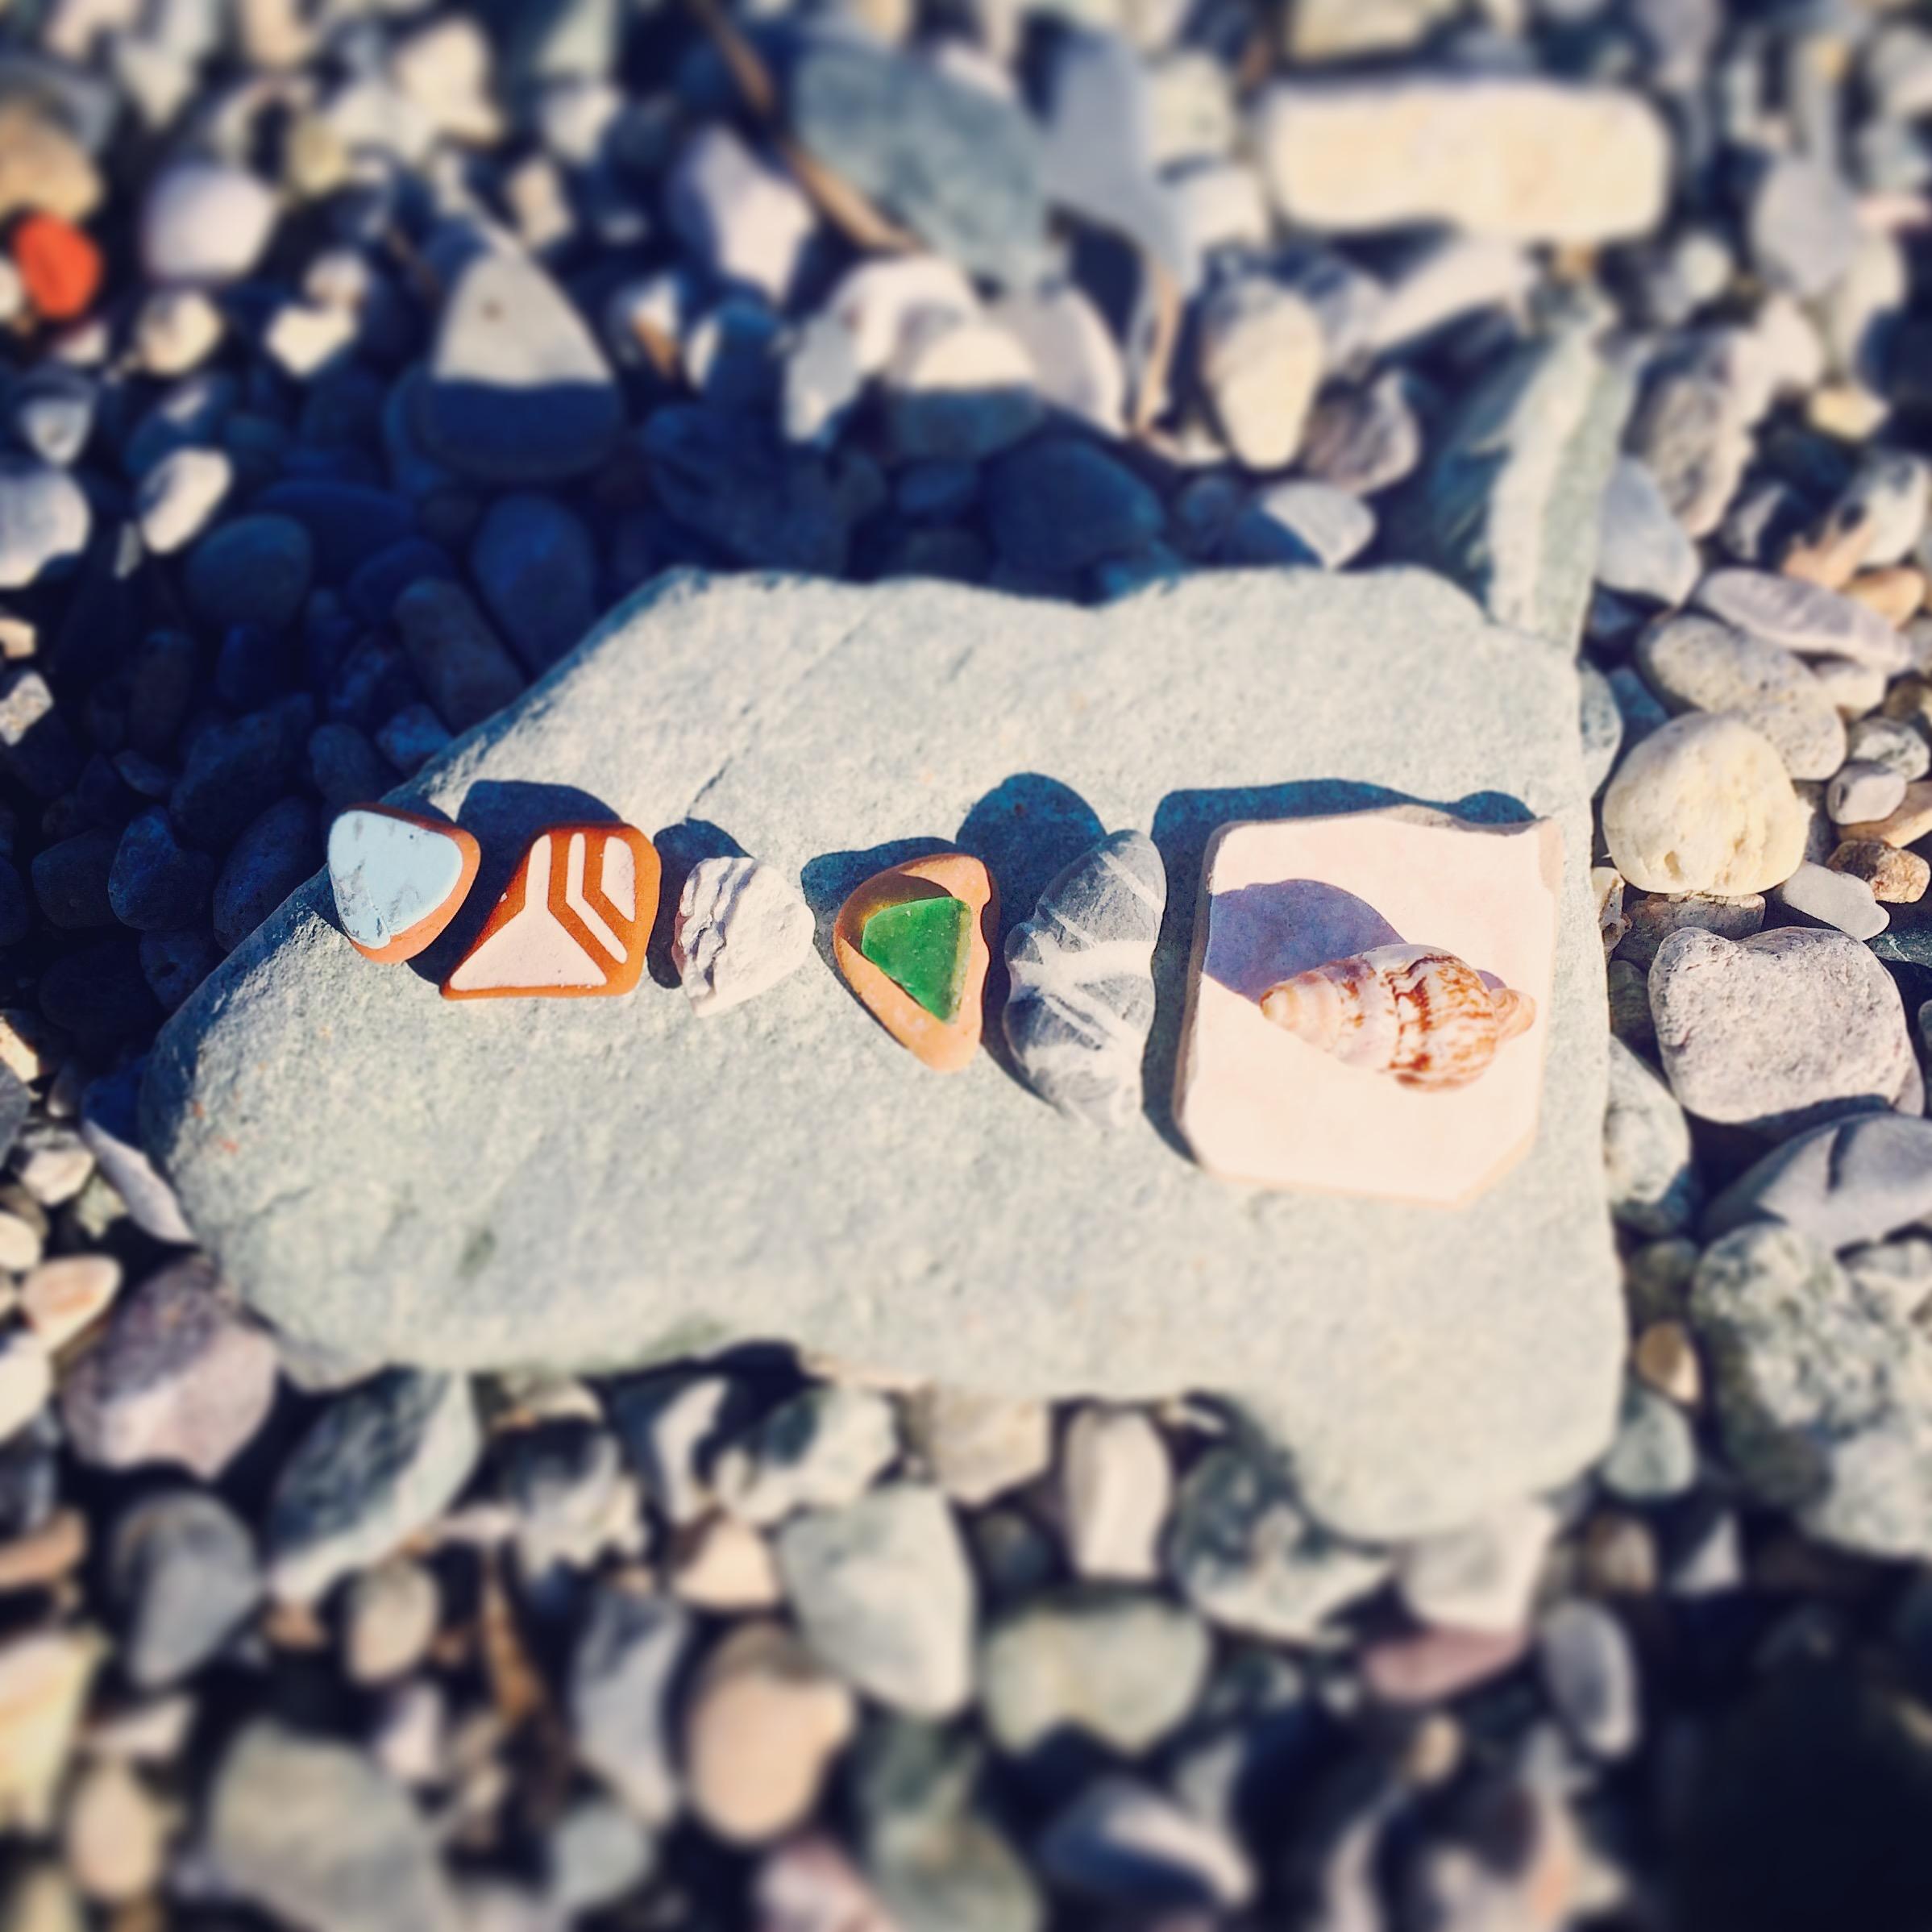 Ceramic pieces found on the shore